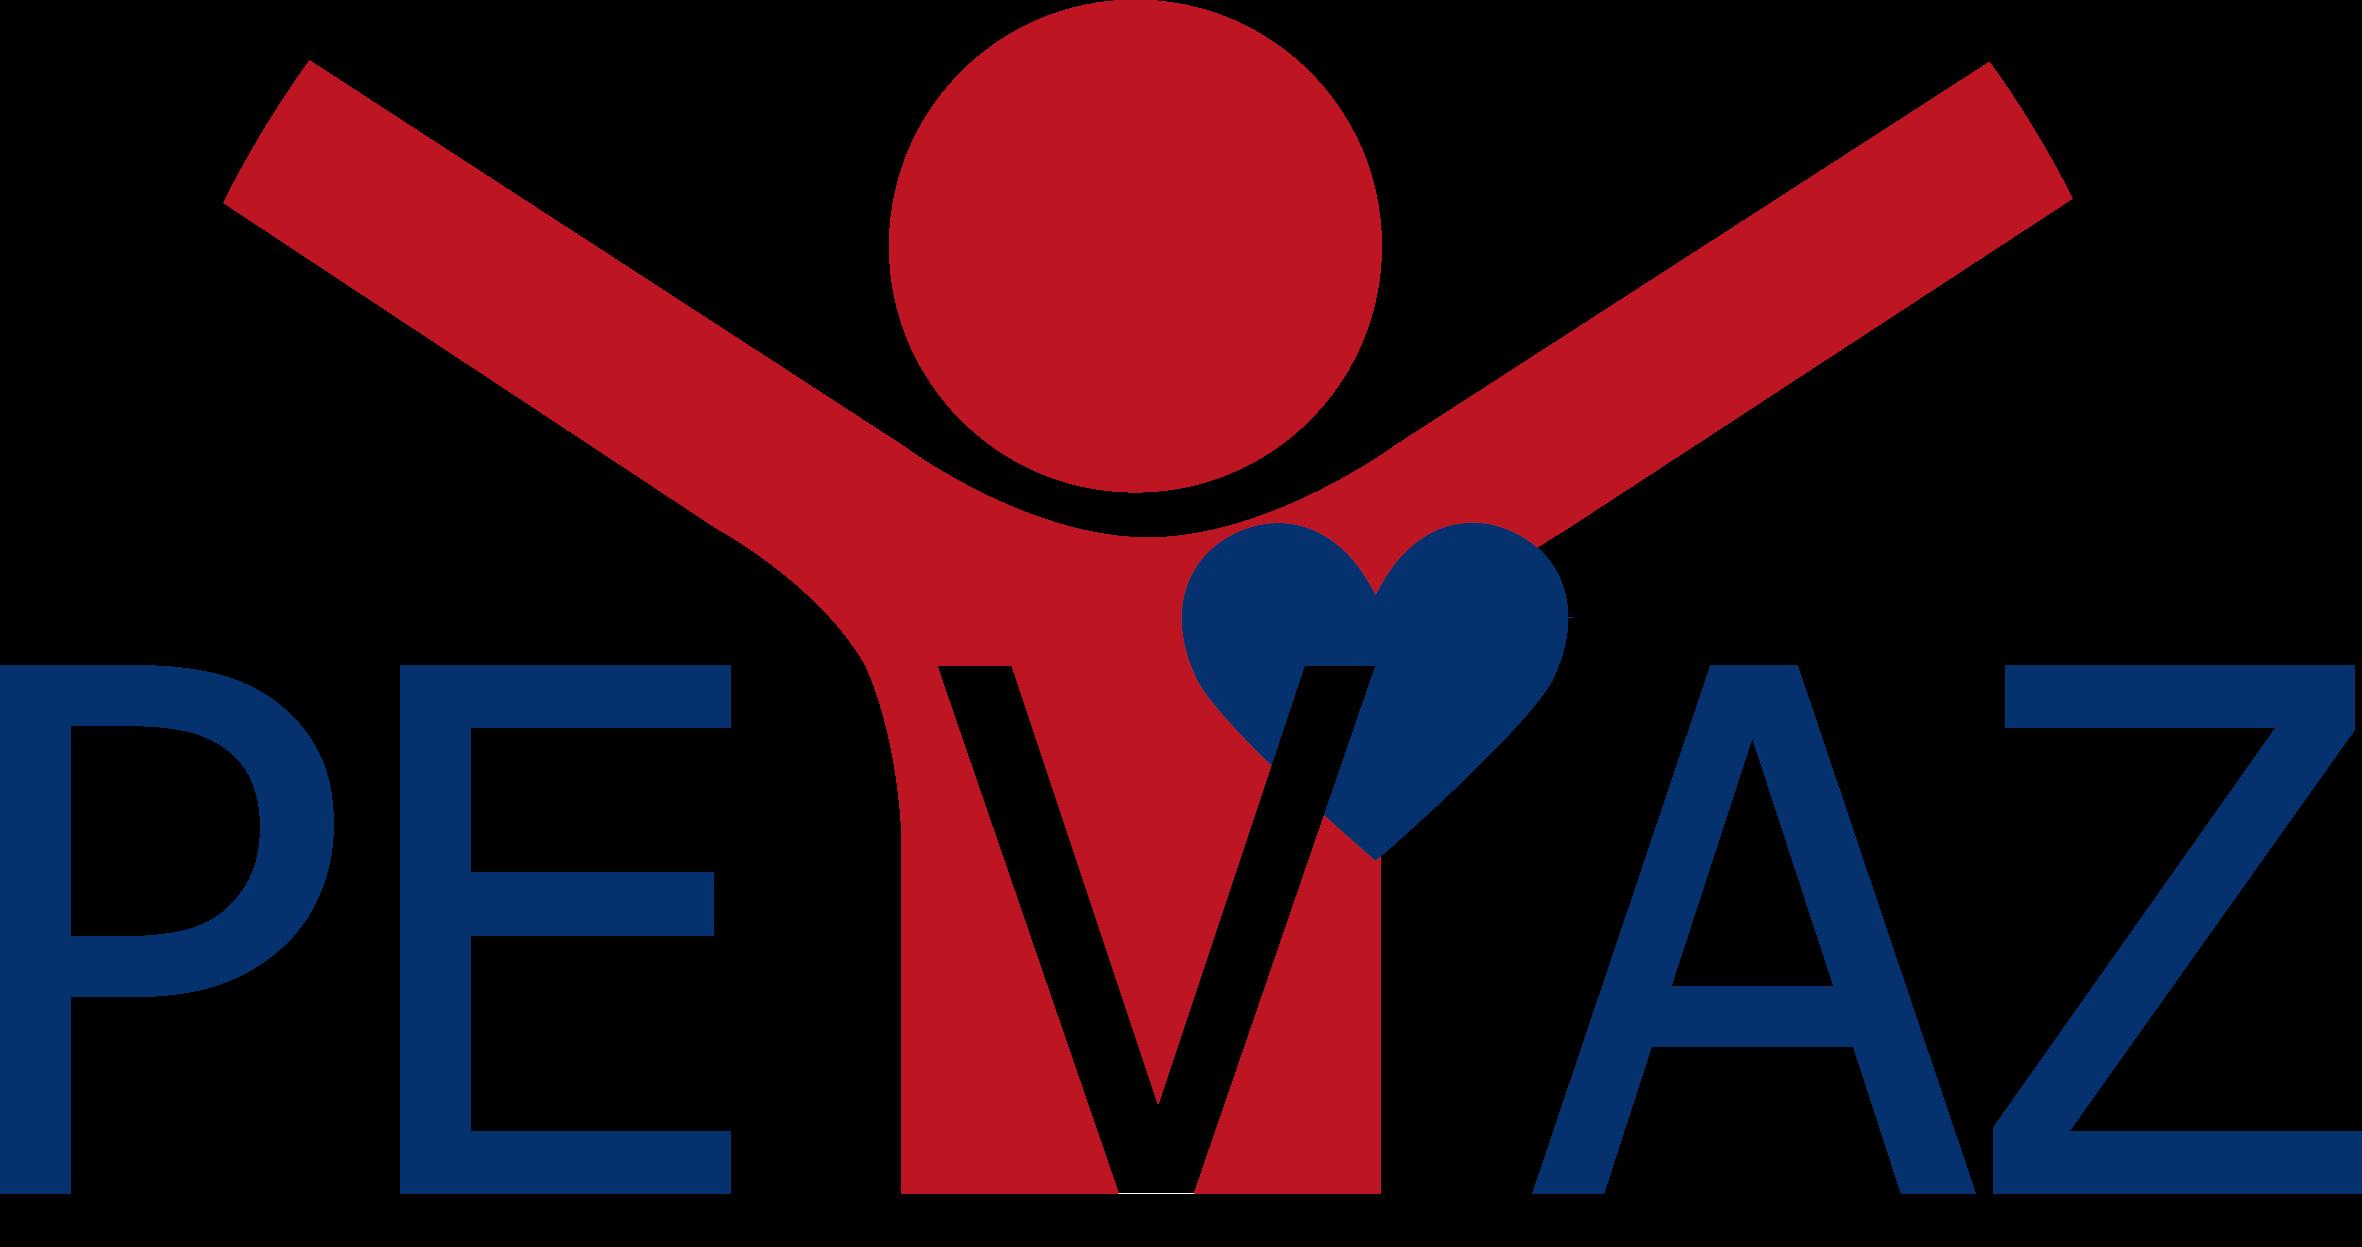 Logo PEVAZ